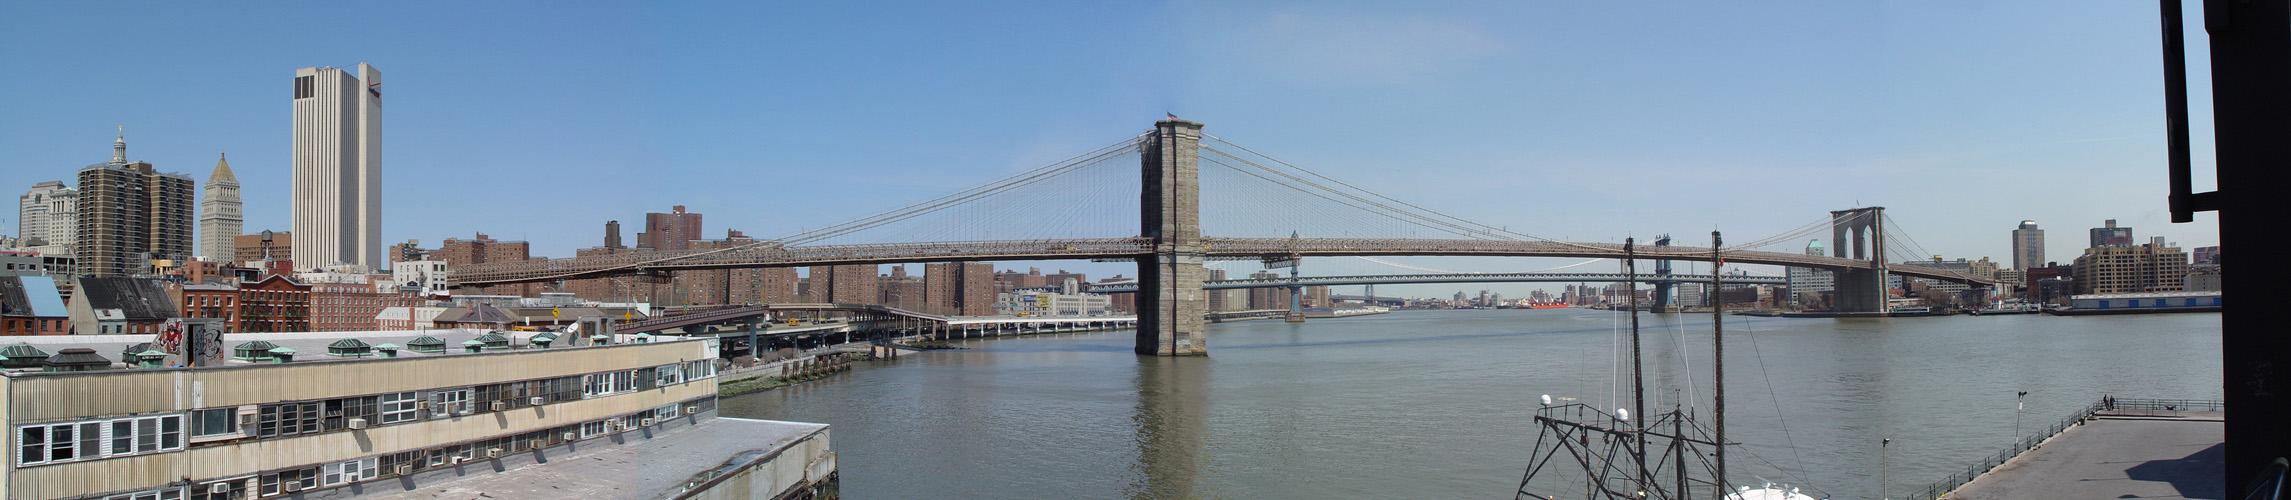 Panaromablick an Brooklyn Bridge